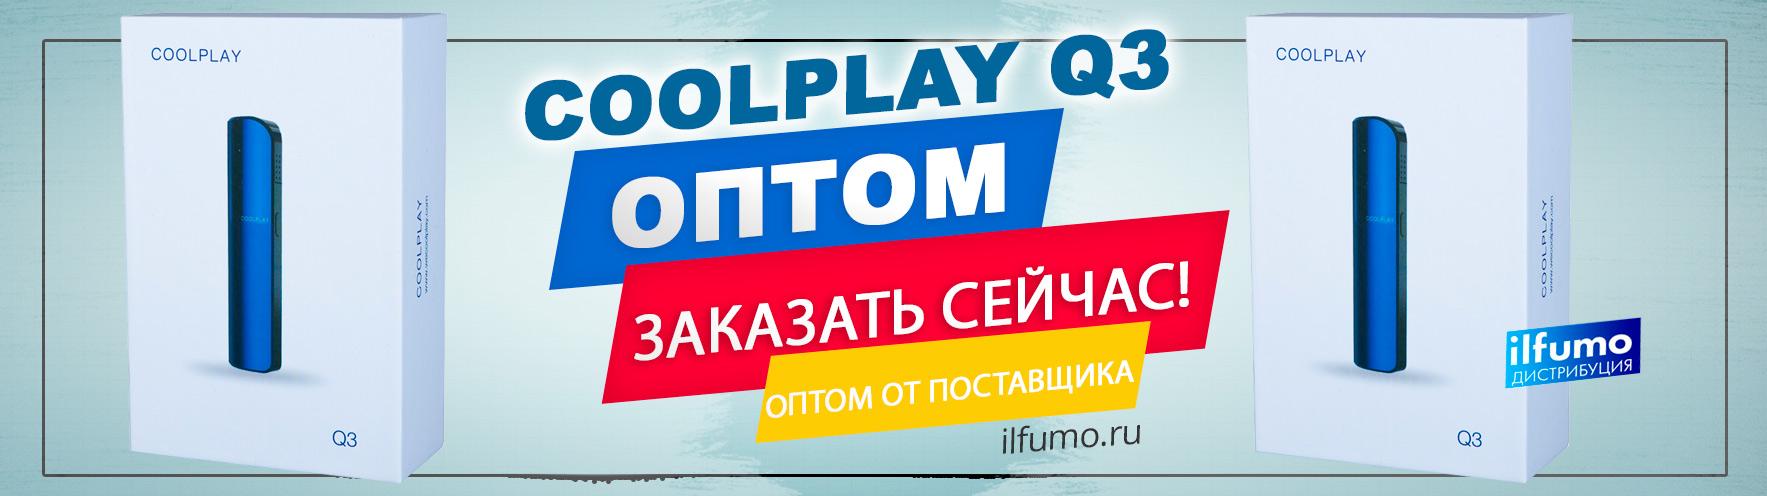 vaporajzer coolplay q3 optom v ilfumo - Вапорайзер Coolplay Q3